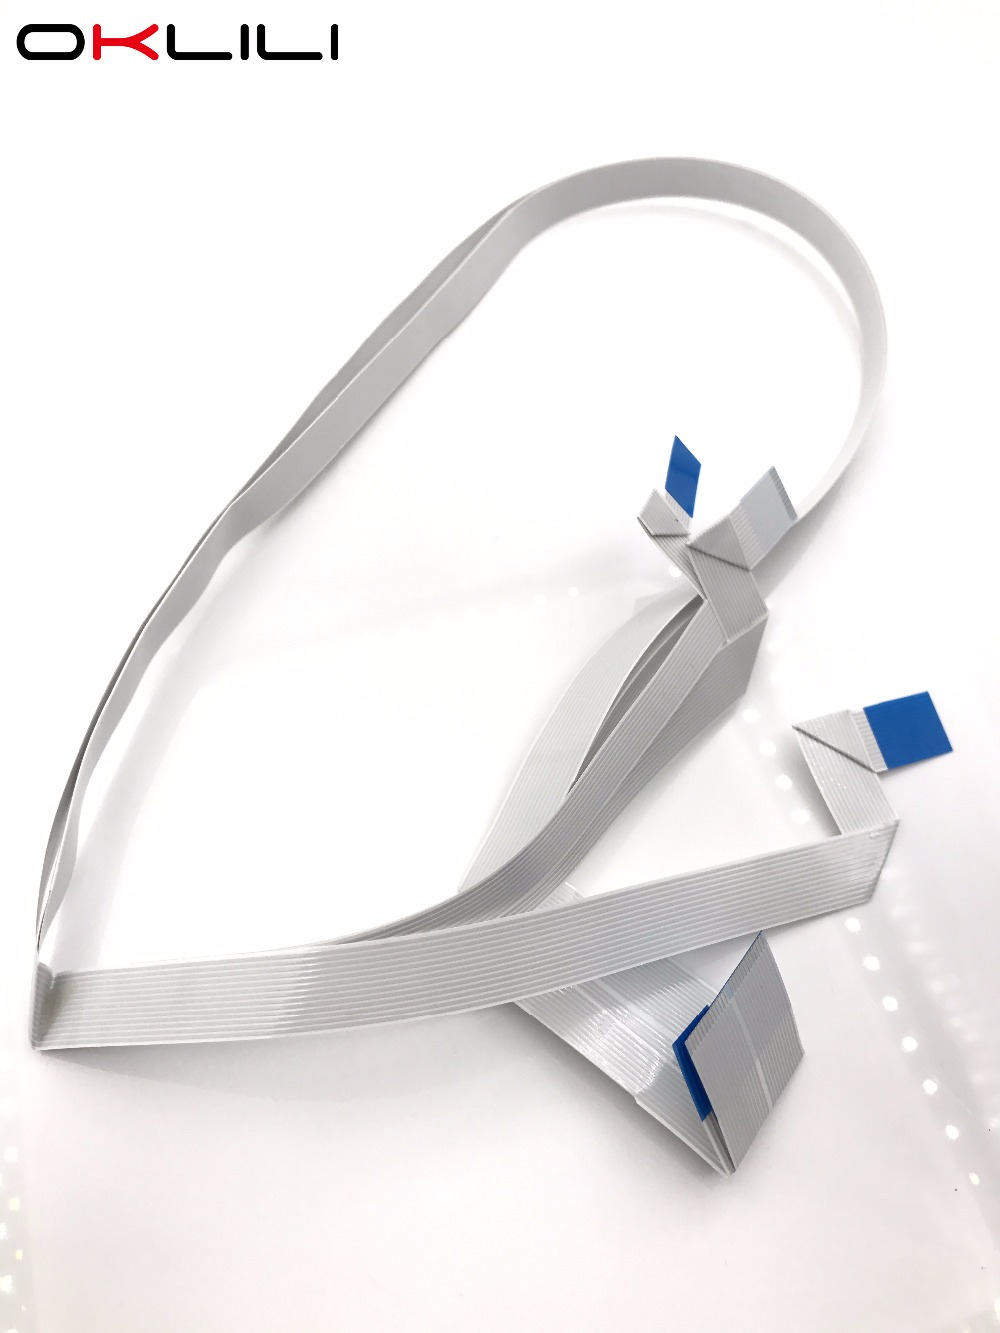 1PCX Printhead Printer Print head Cable for Epson 1390 1400 1410 1430 R260 R360 R380 R390 RX580 RX590 L1800 1500W EP4004 guess beachwear лиф треугольник